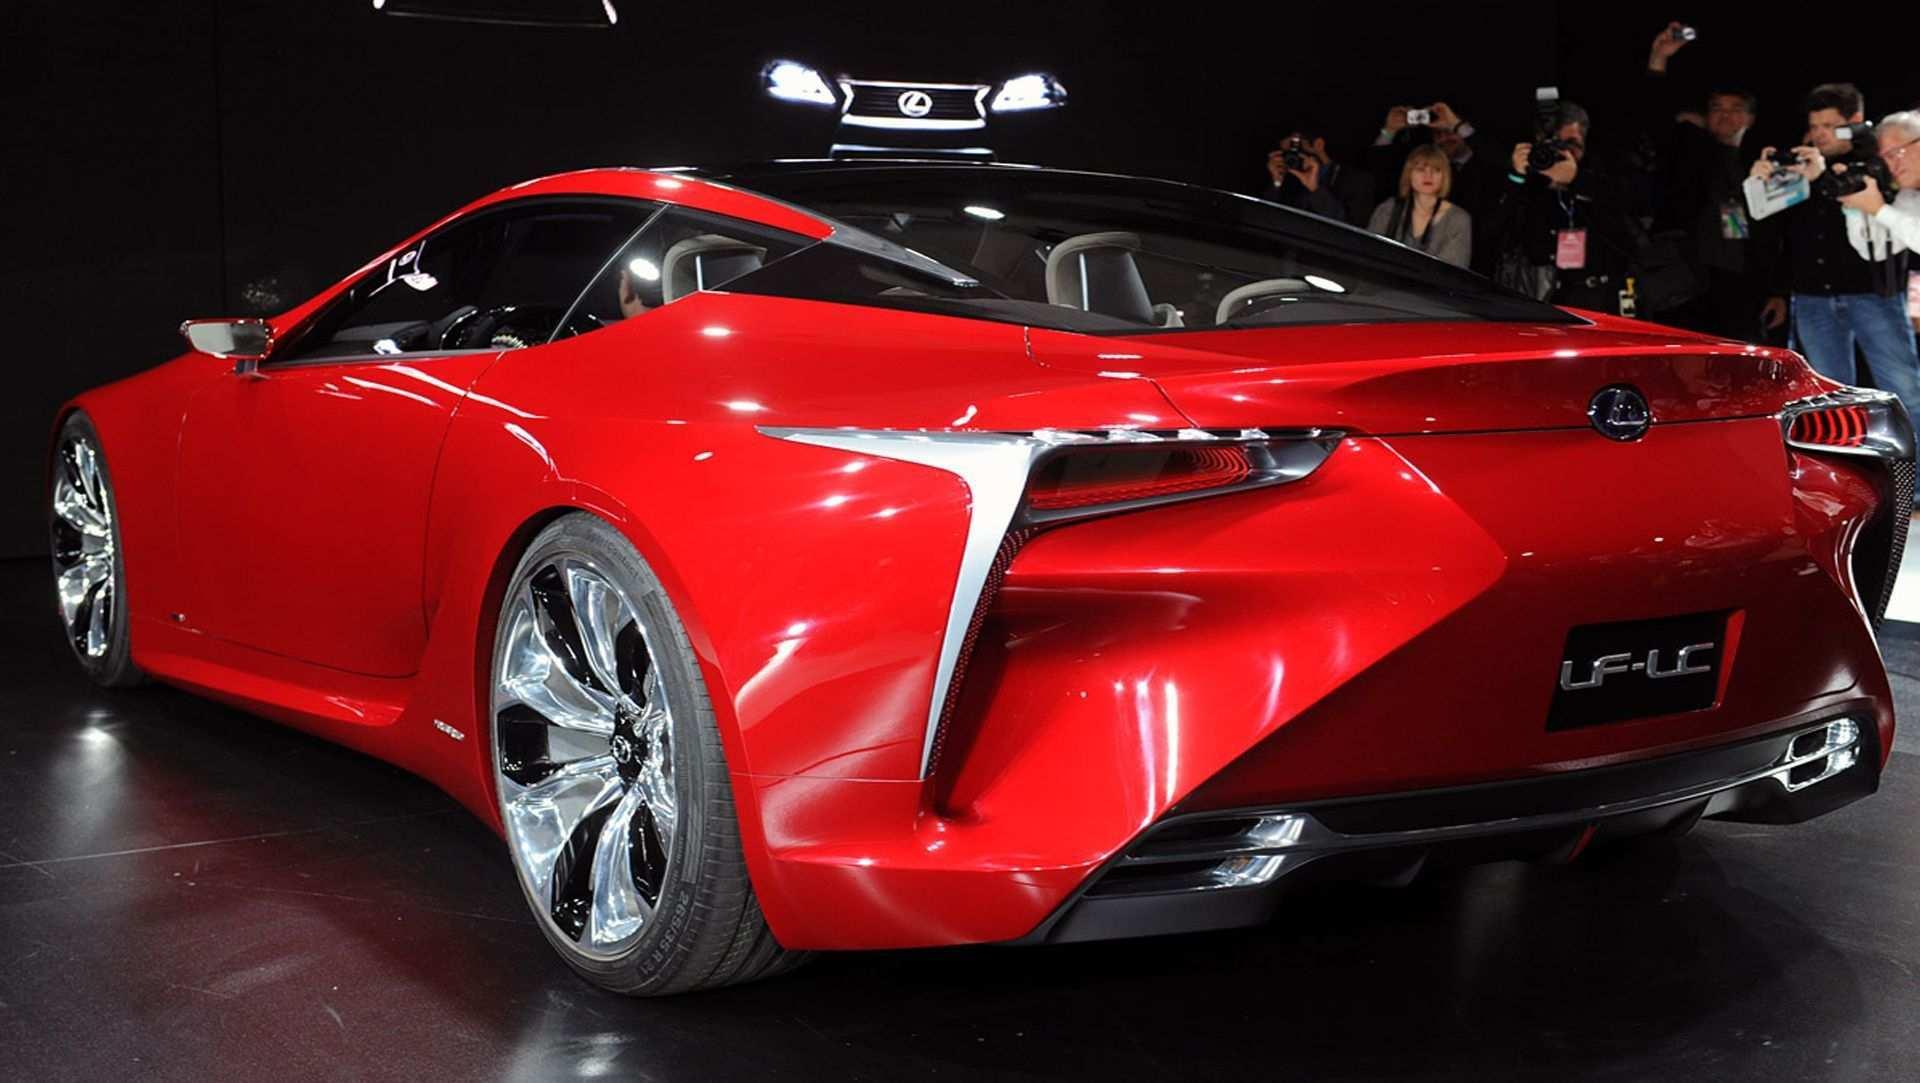 69 All New Lexus 2020 Sport New Concept for Lexus 2020 Sport